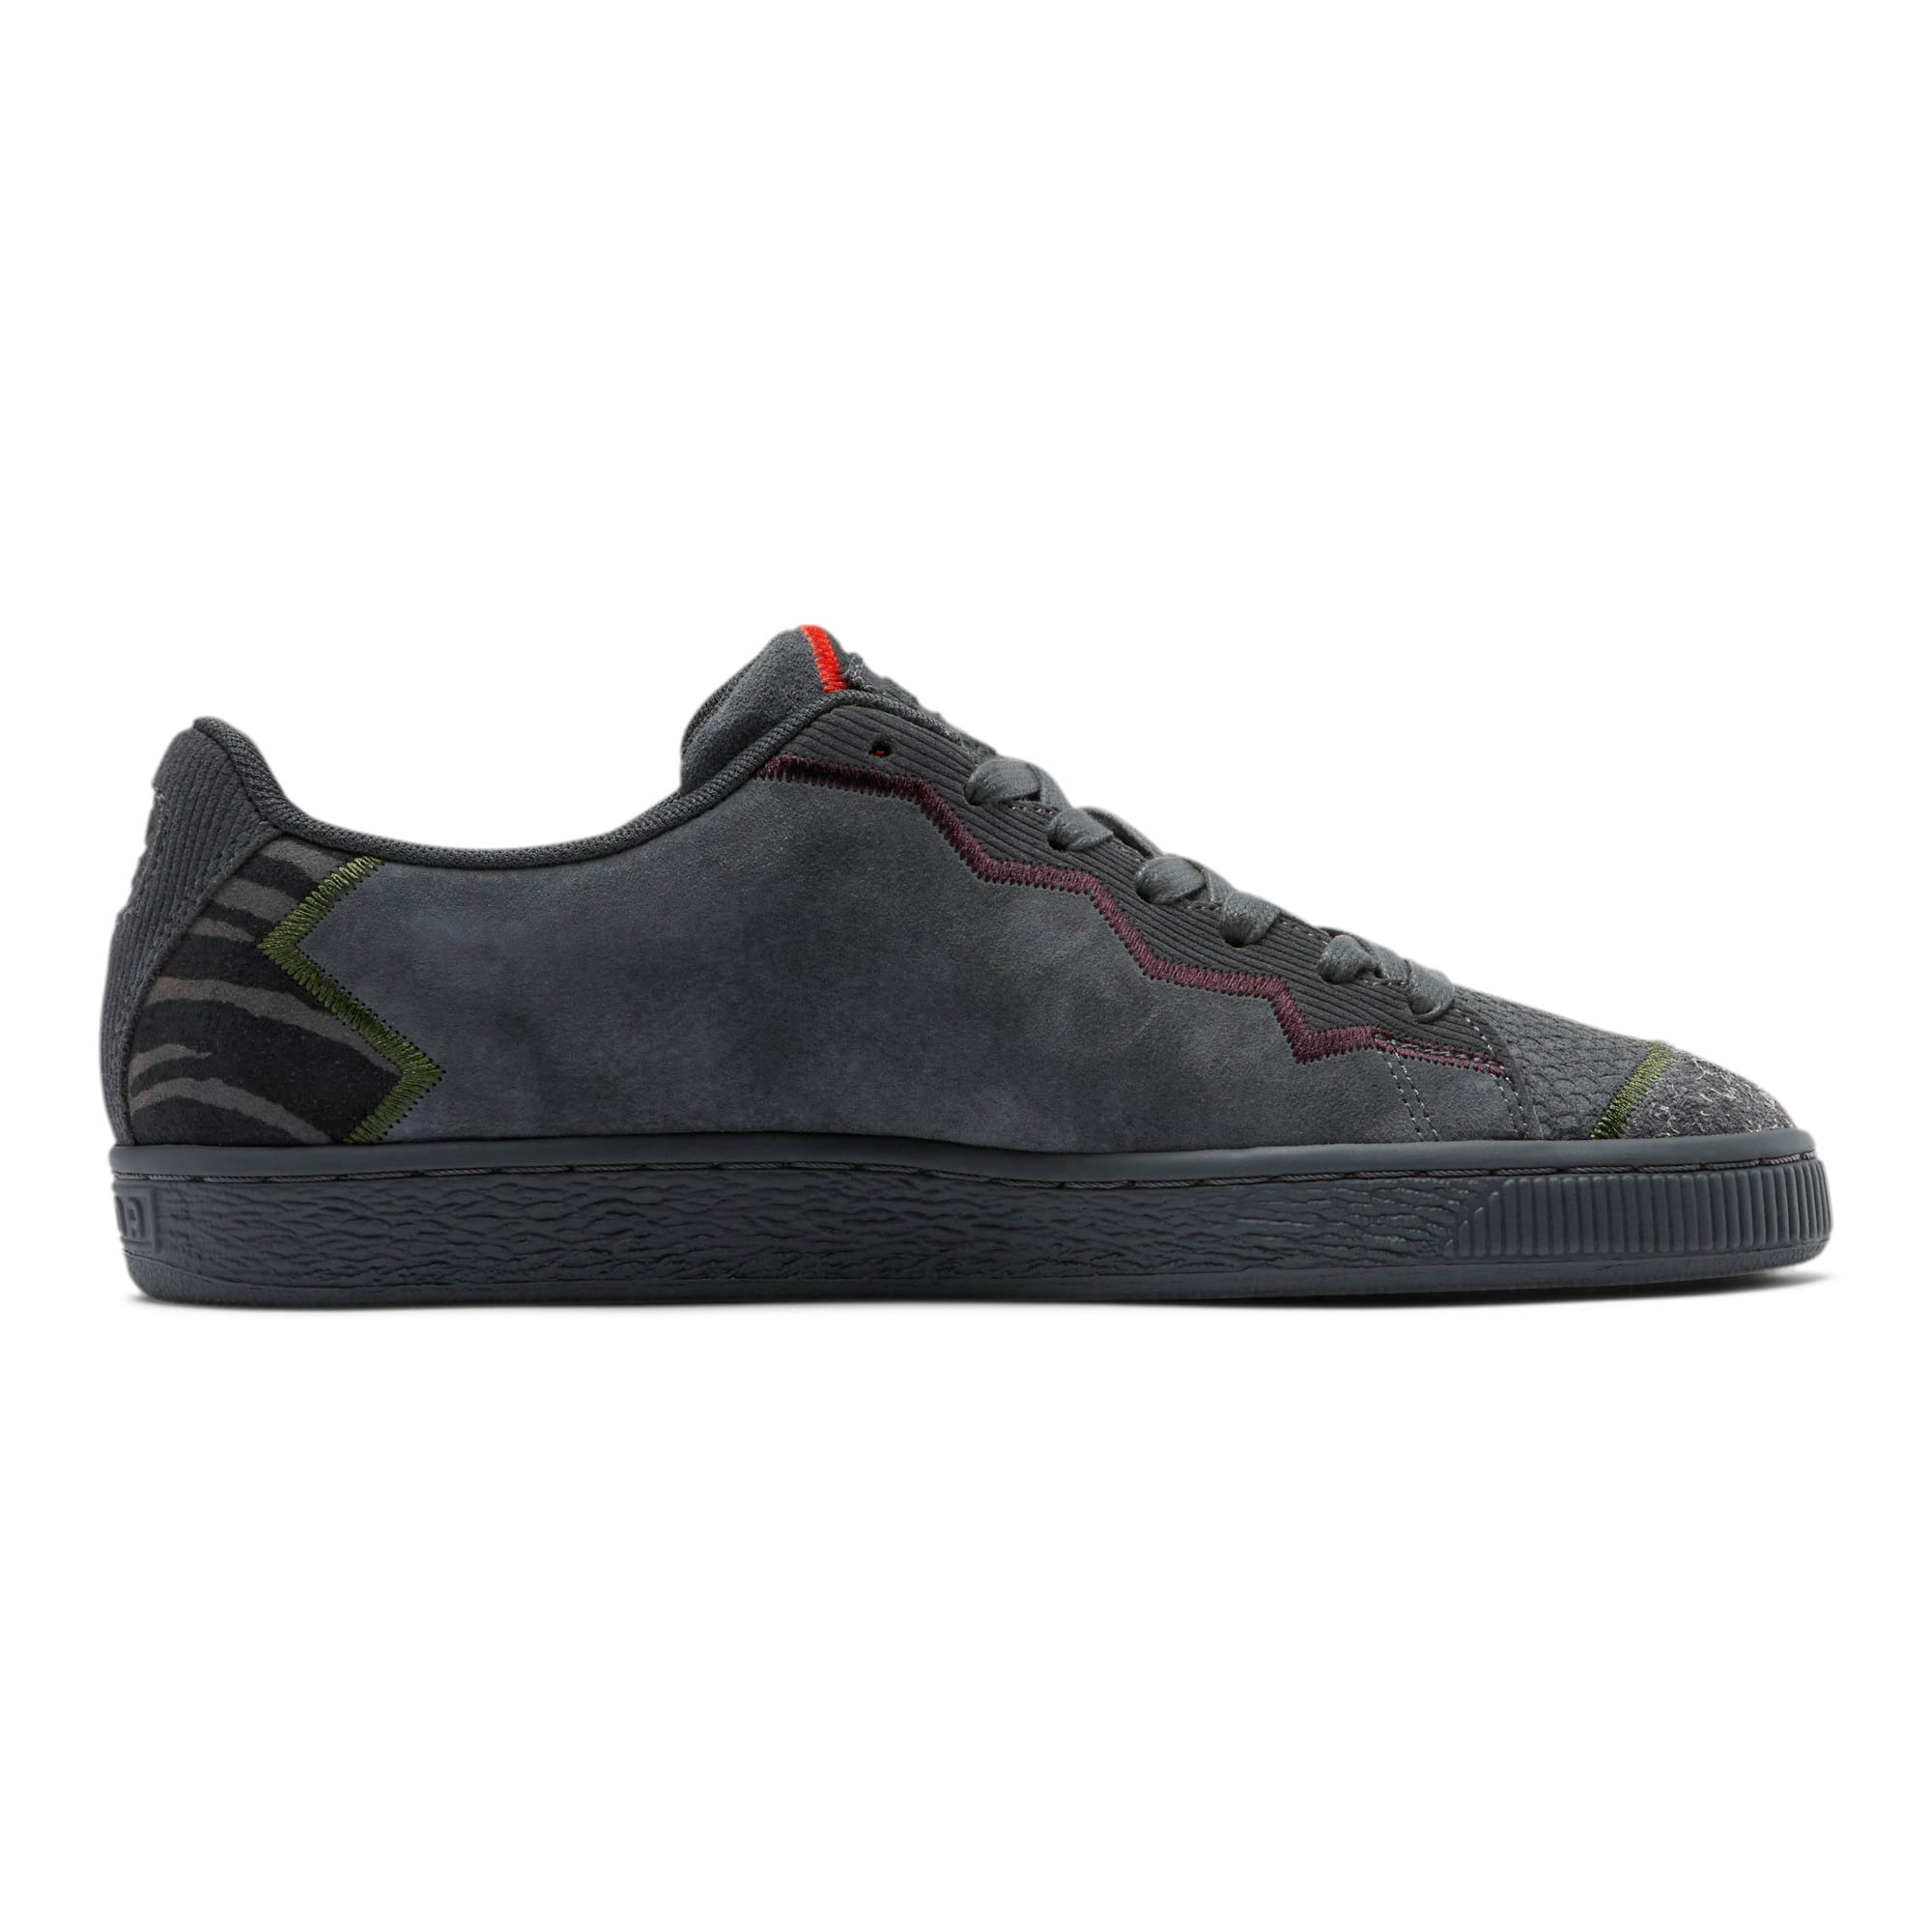 Thumbnail 5 of Suede RP Fashion Geek Sneakers, Asphalt, medium